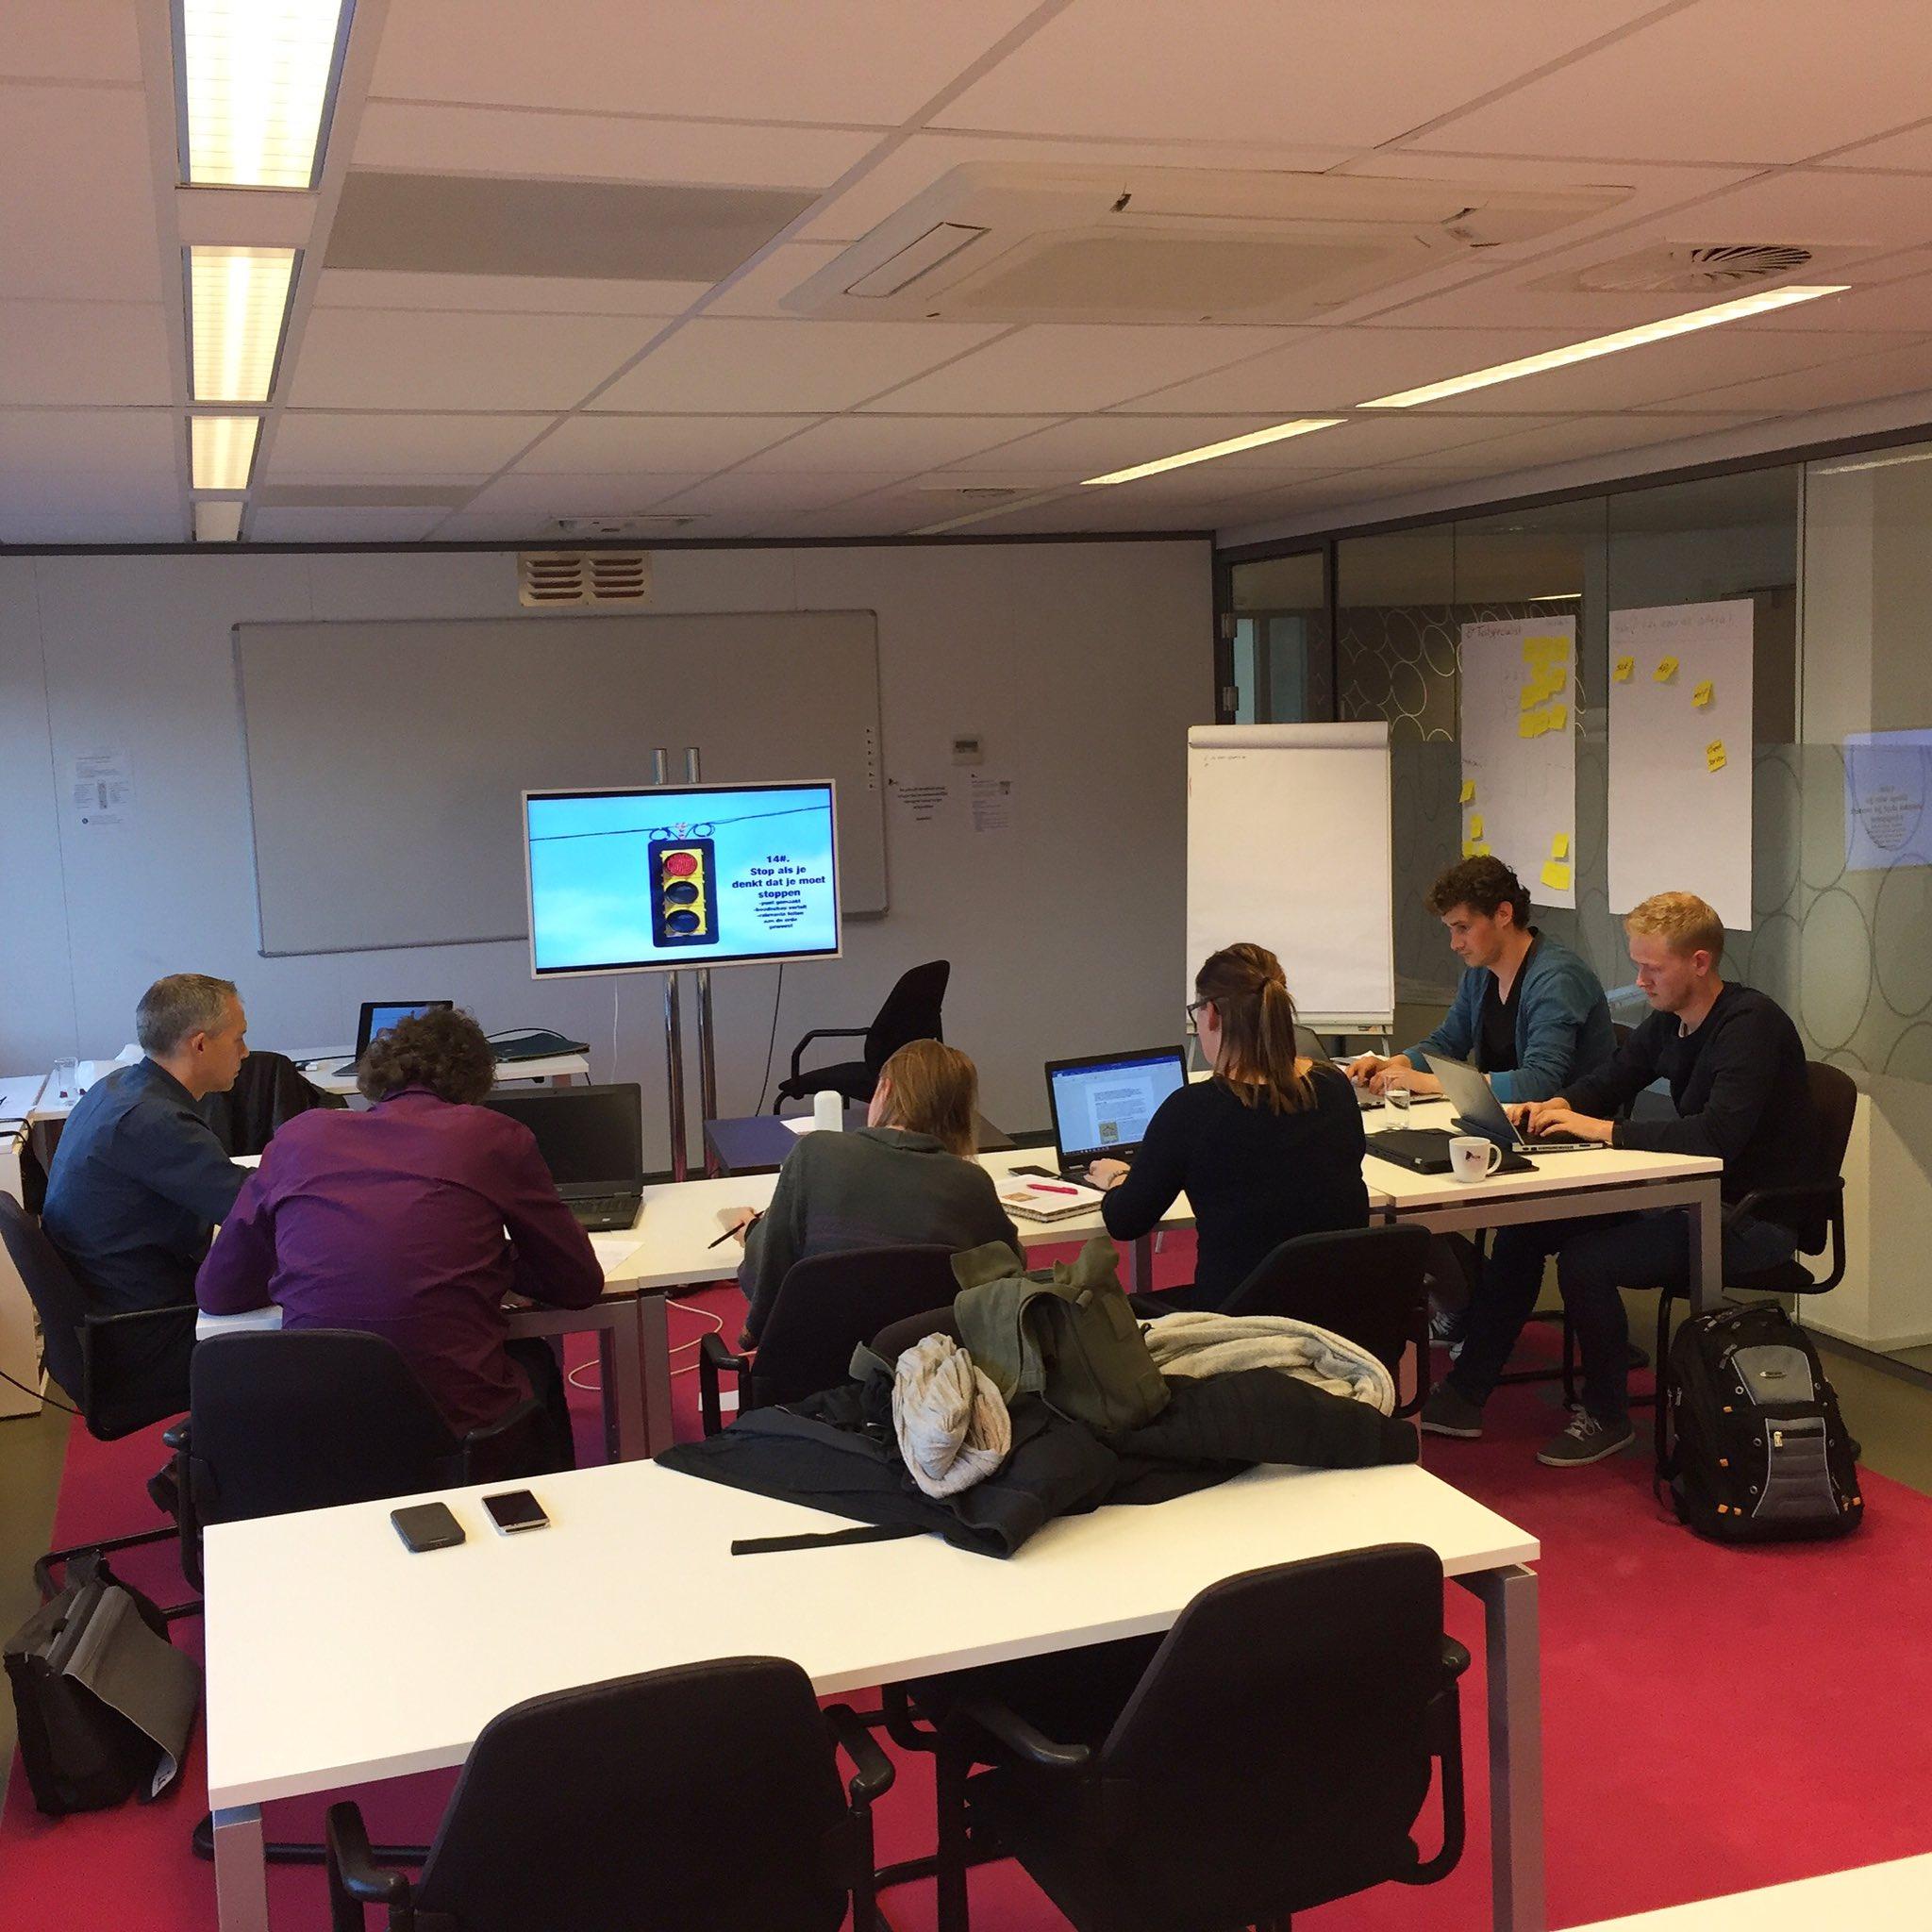 Workshop Creative writing. Cursisten at work. Stoplicht staat op rood. https://t.co/Sv8h0qa4xa